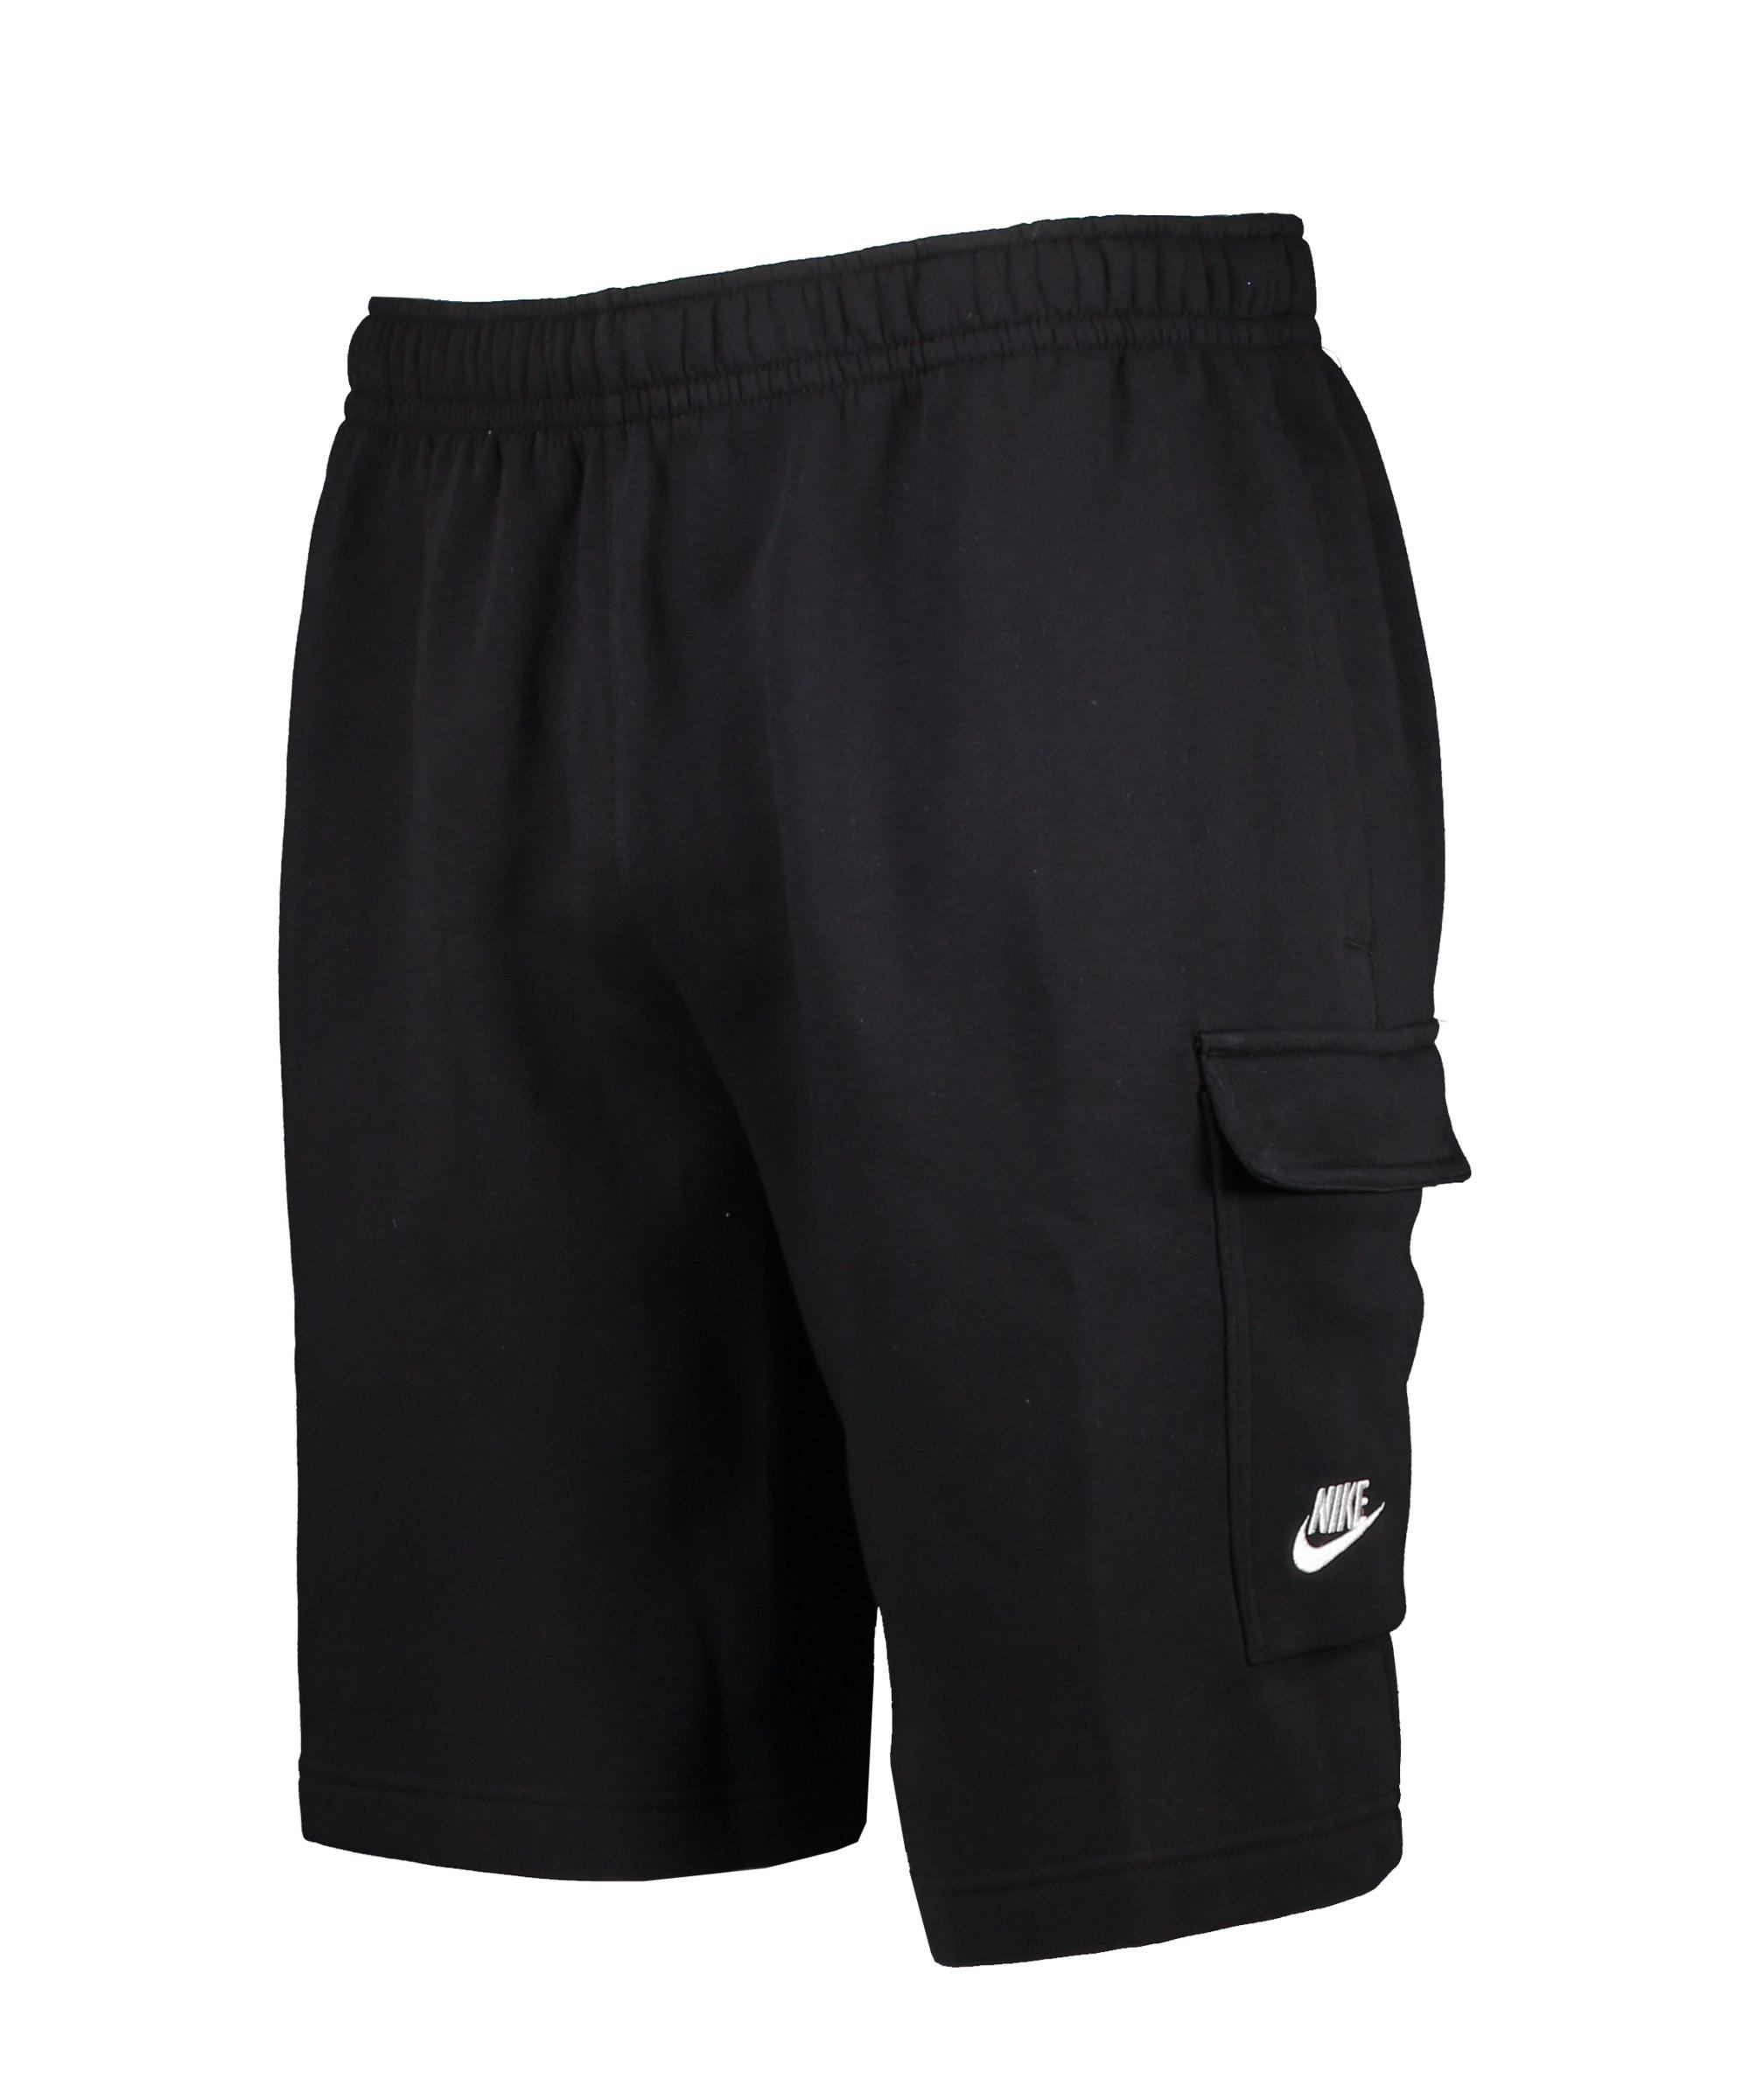 Nike Club Cargo Short Schwarz F010 - schwarz